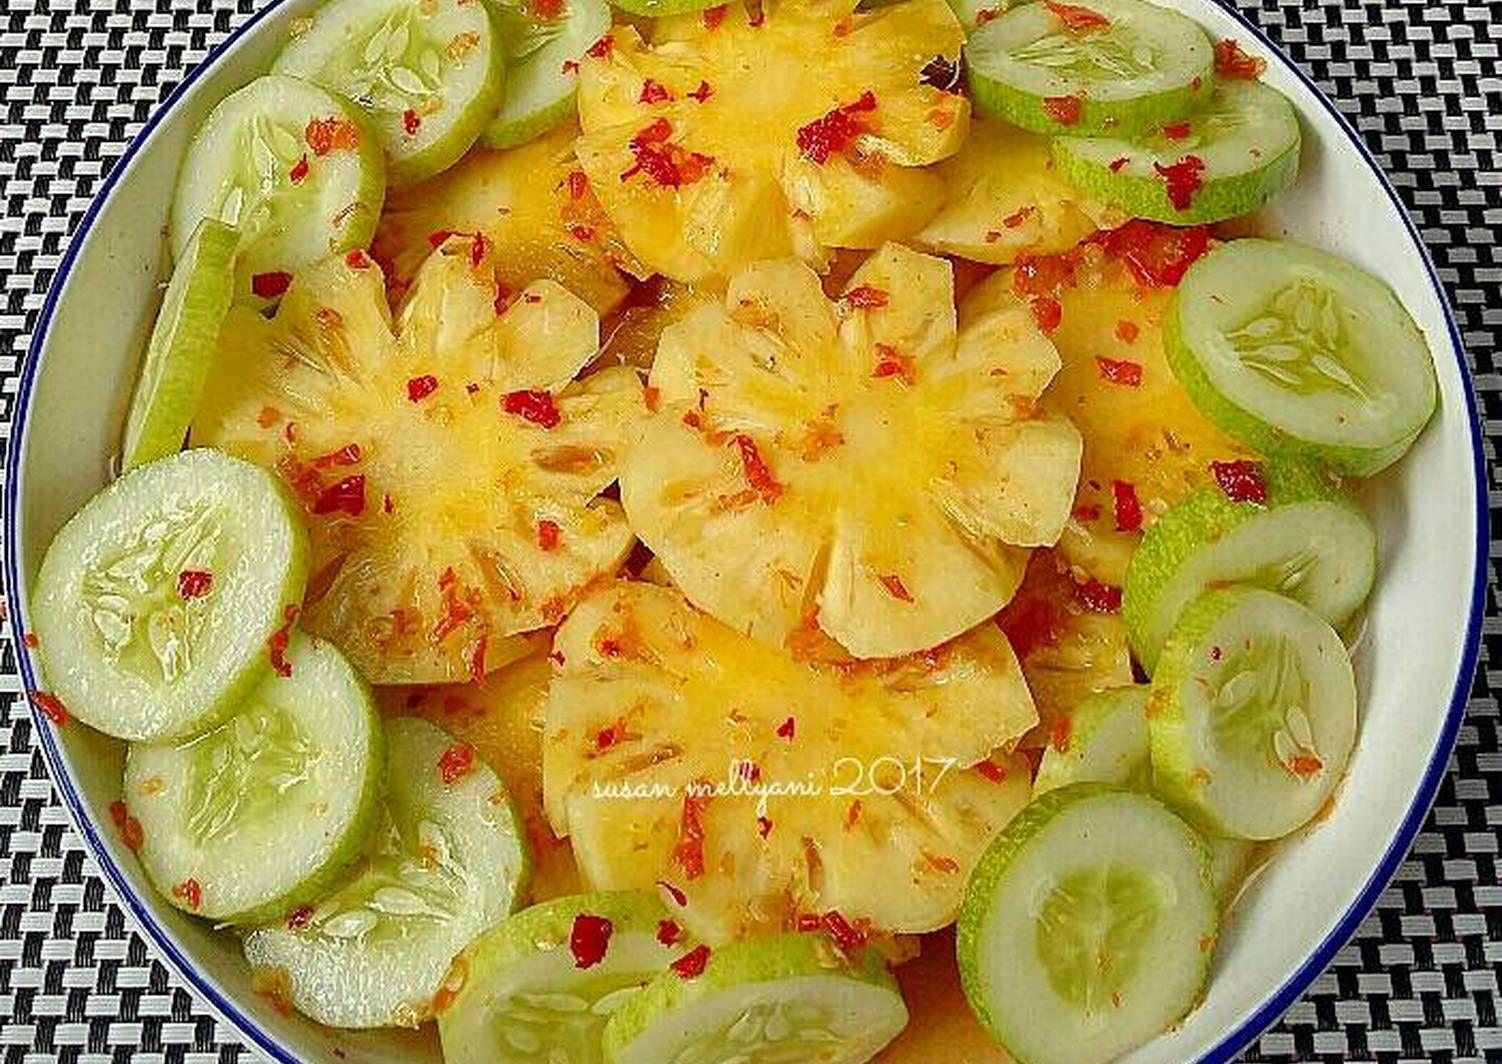 Resep Asinan Nanas Oleh Susan Mellyani Resep Resep Resep Makanan Makanan Dan Minuman